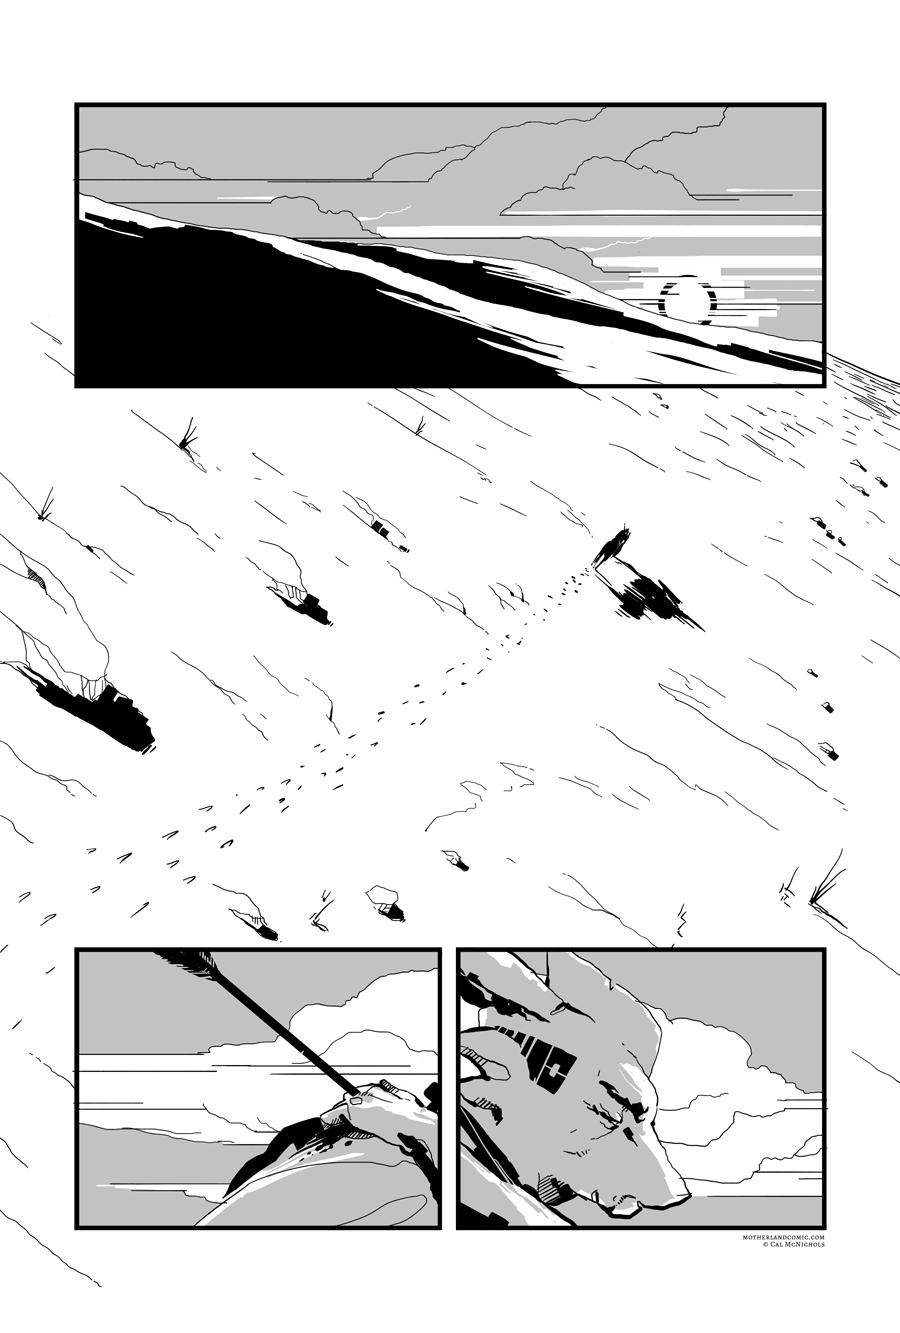 pg 49